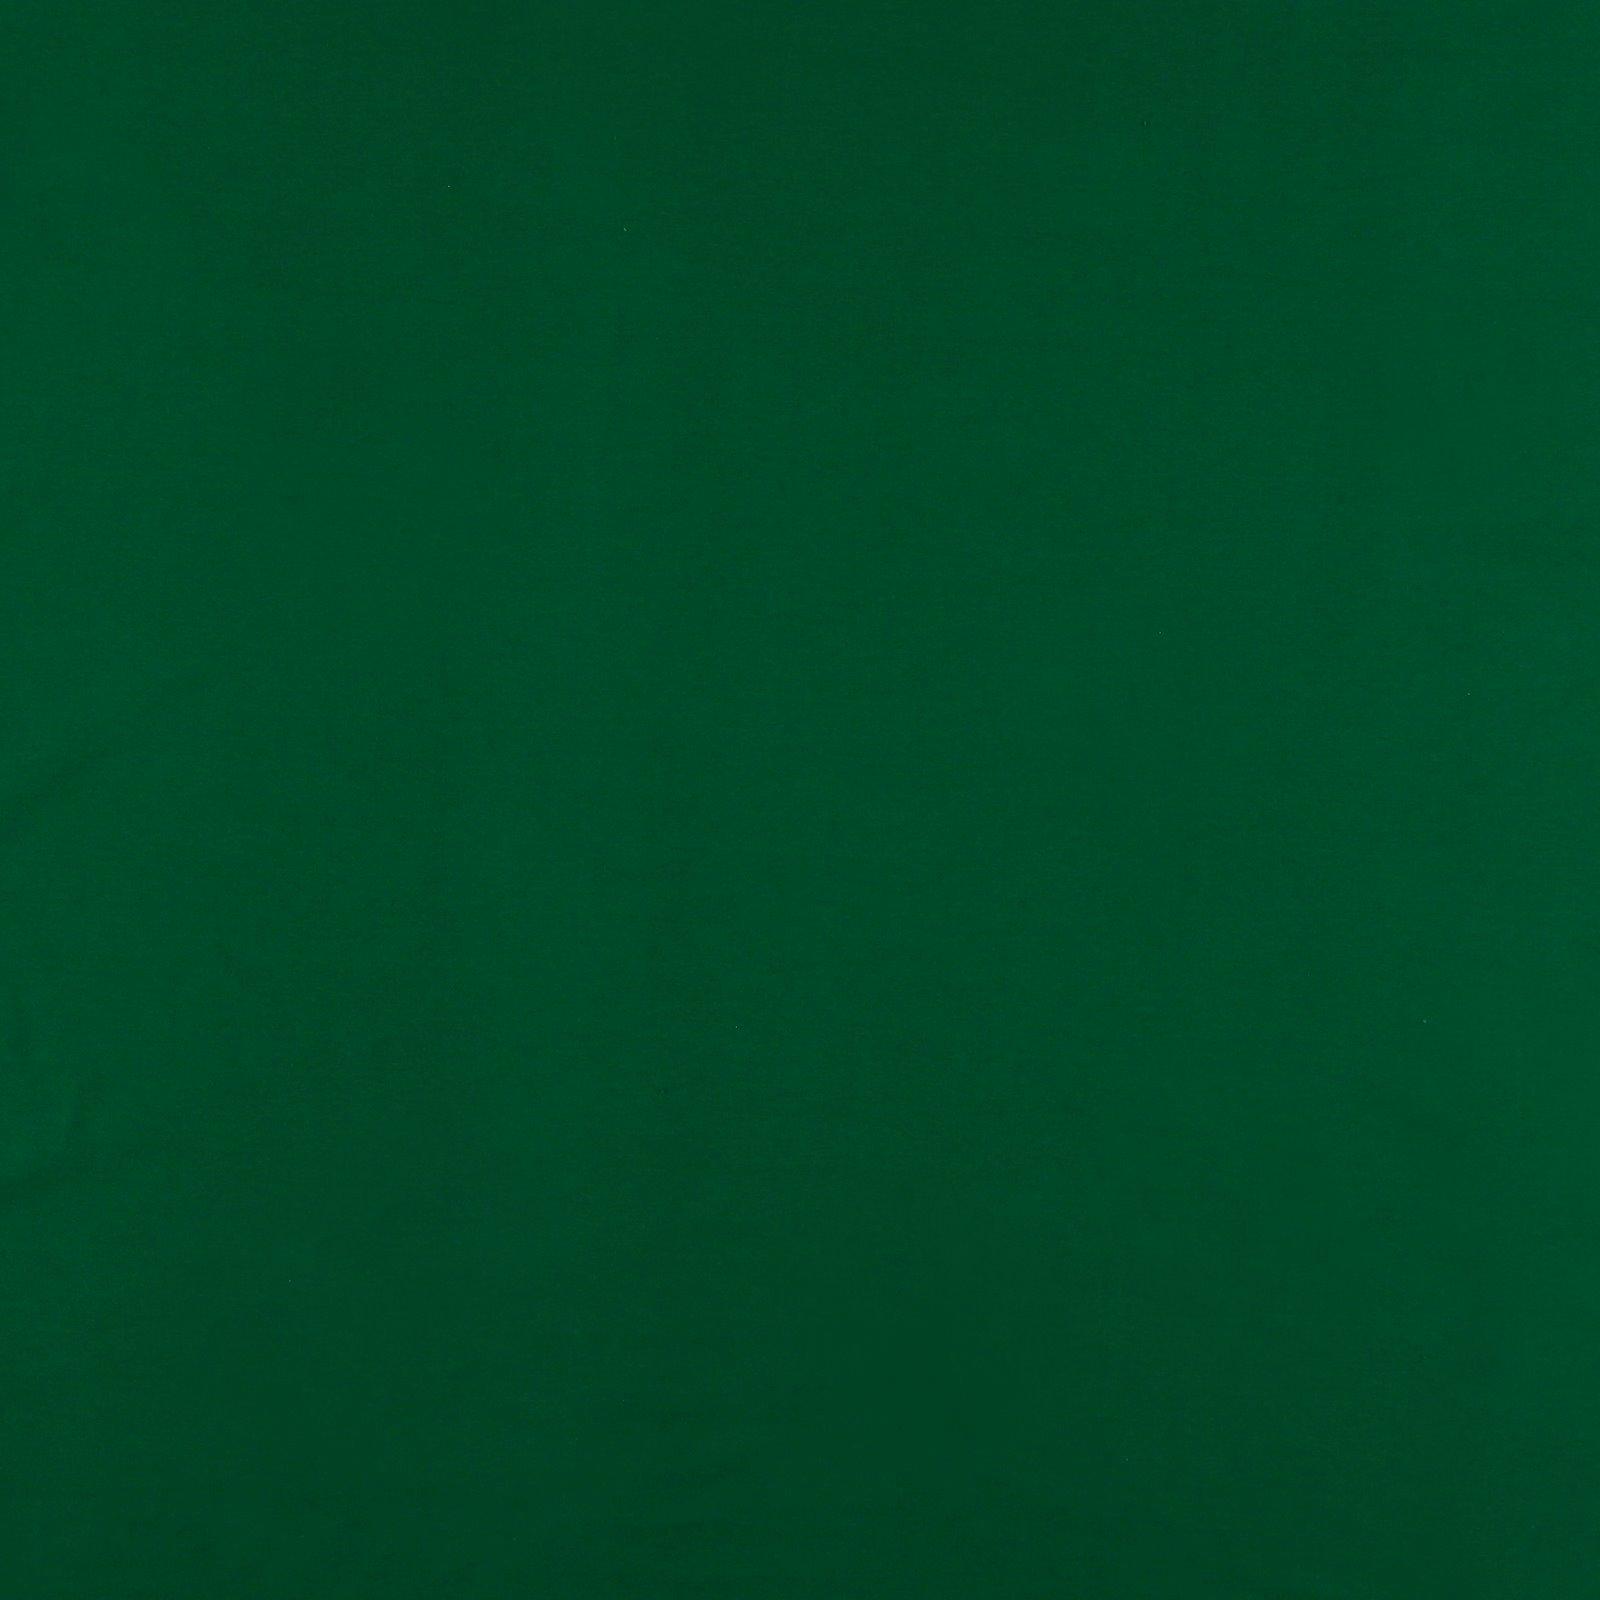 Organic rib dark green 230621_pack_solid